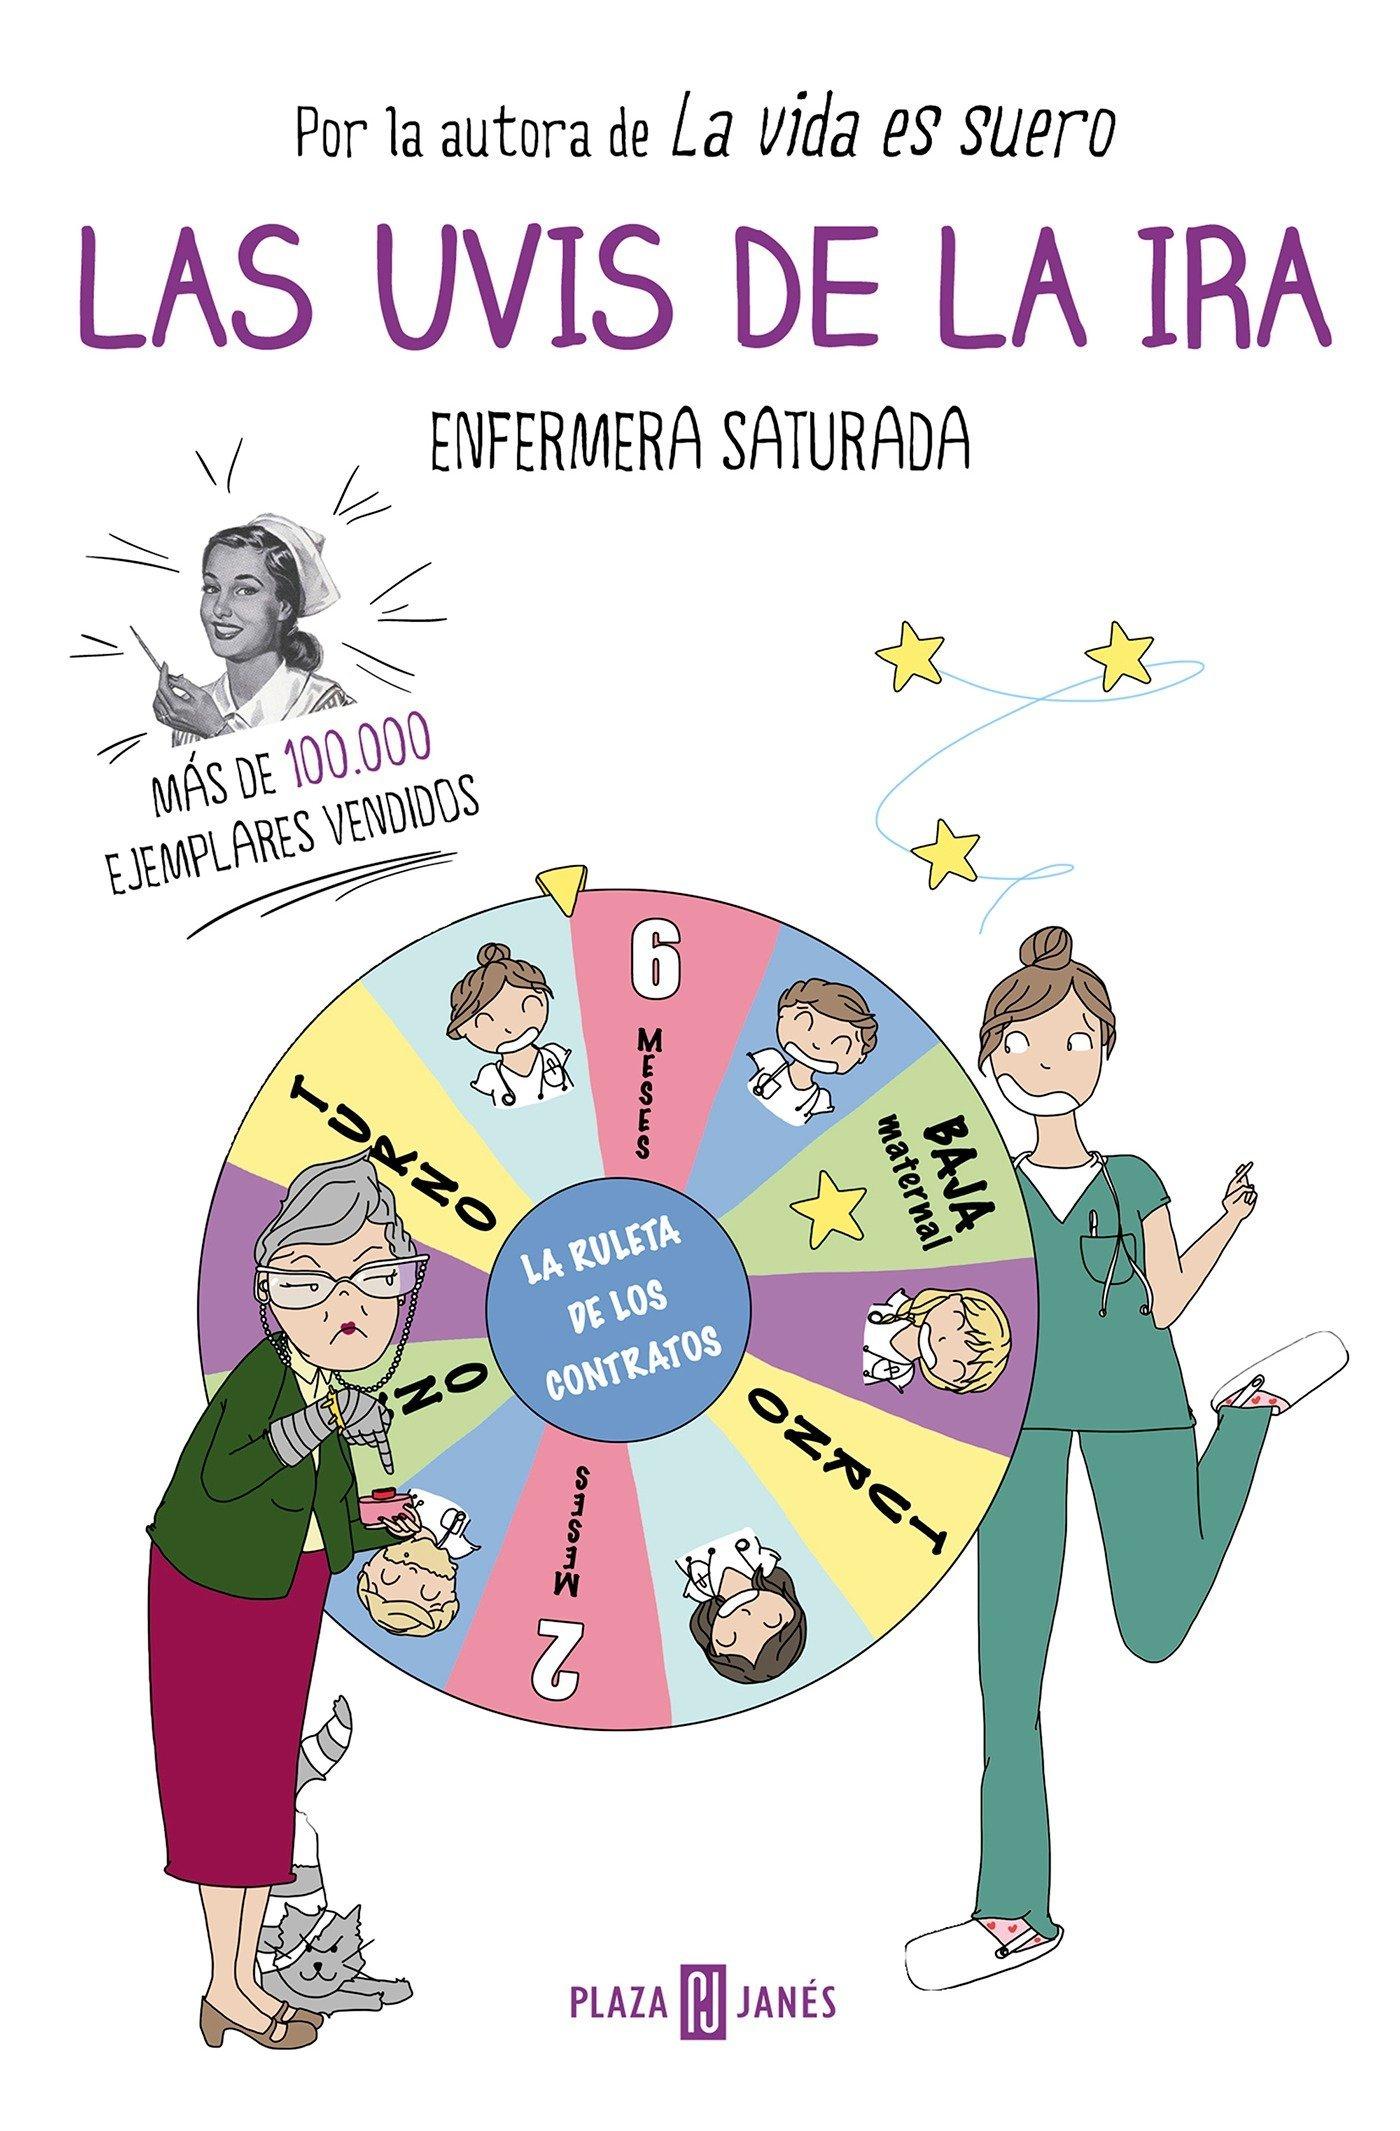 Las uvis de la ira (OBRAS DIVERSAS) Tapa blanda – 13 oct 2016 Enfermera Saturada PLAZA & JANES 8401017556 Nurses; Spain; Anecdotes.